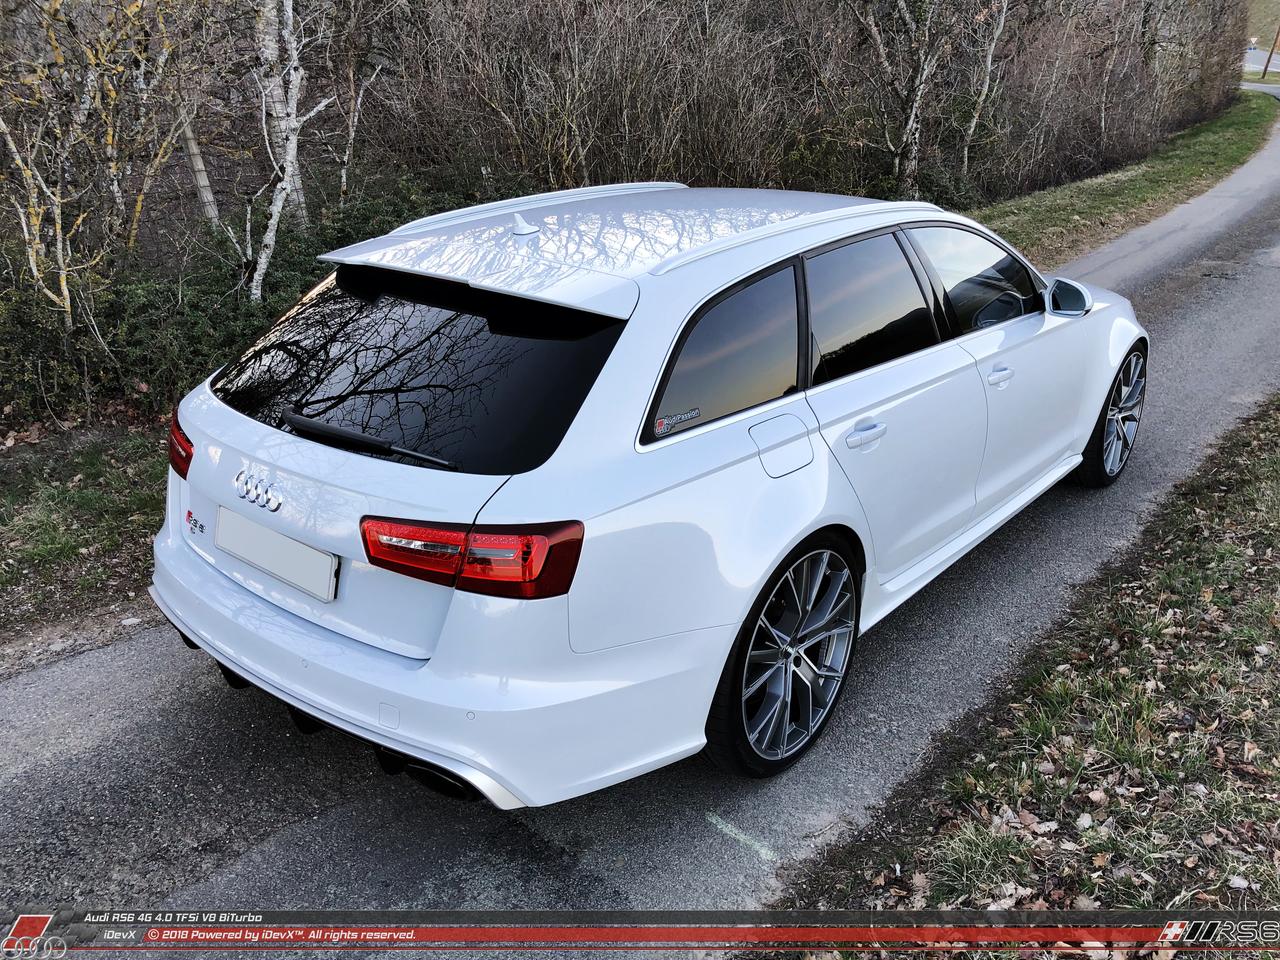 22_02.2019_Audi-RS6_iDevX_006.png